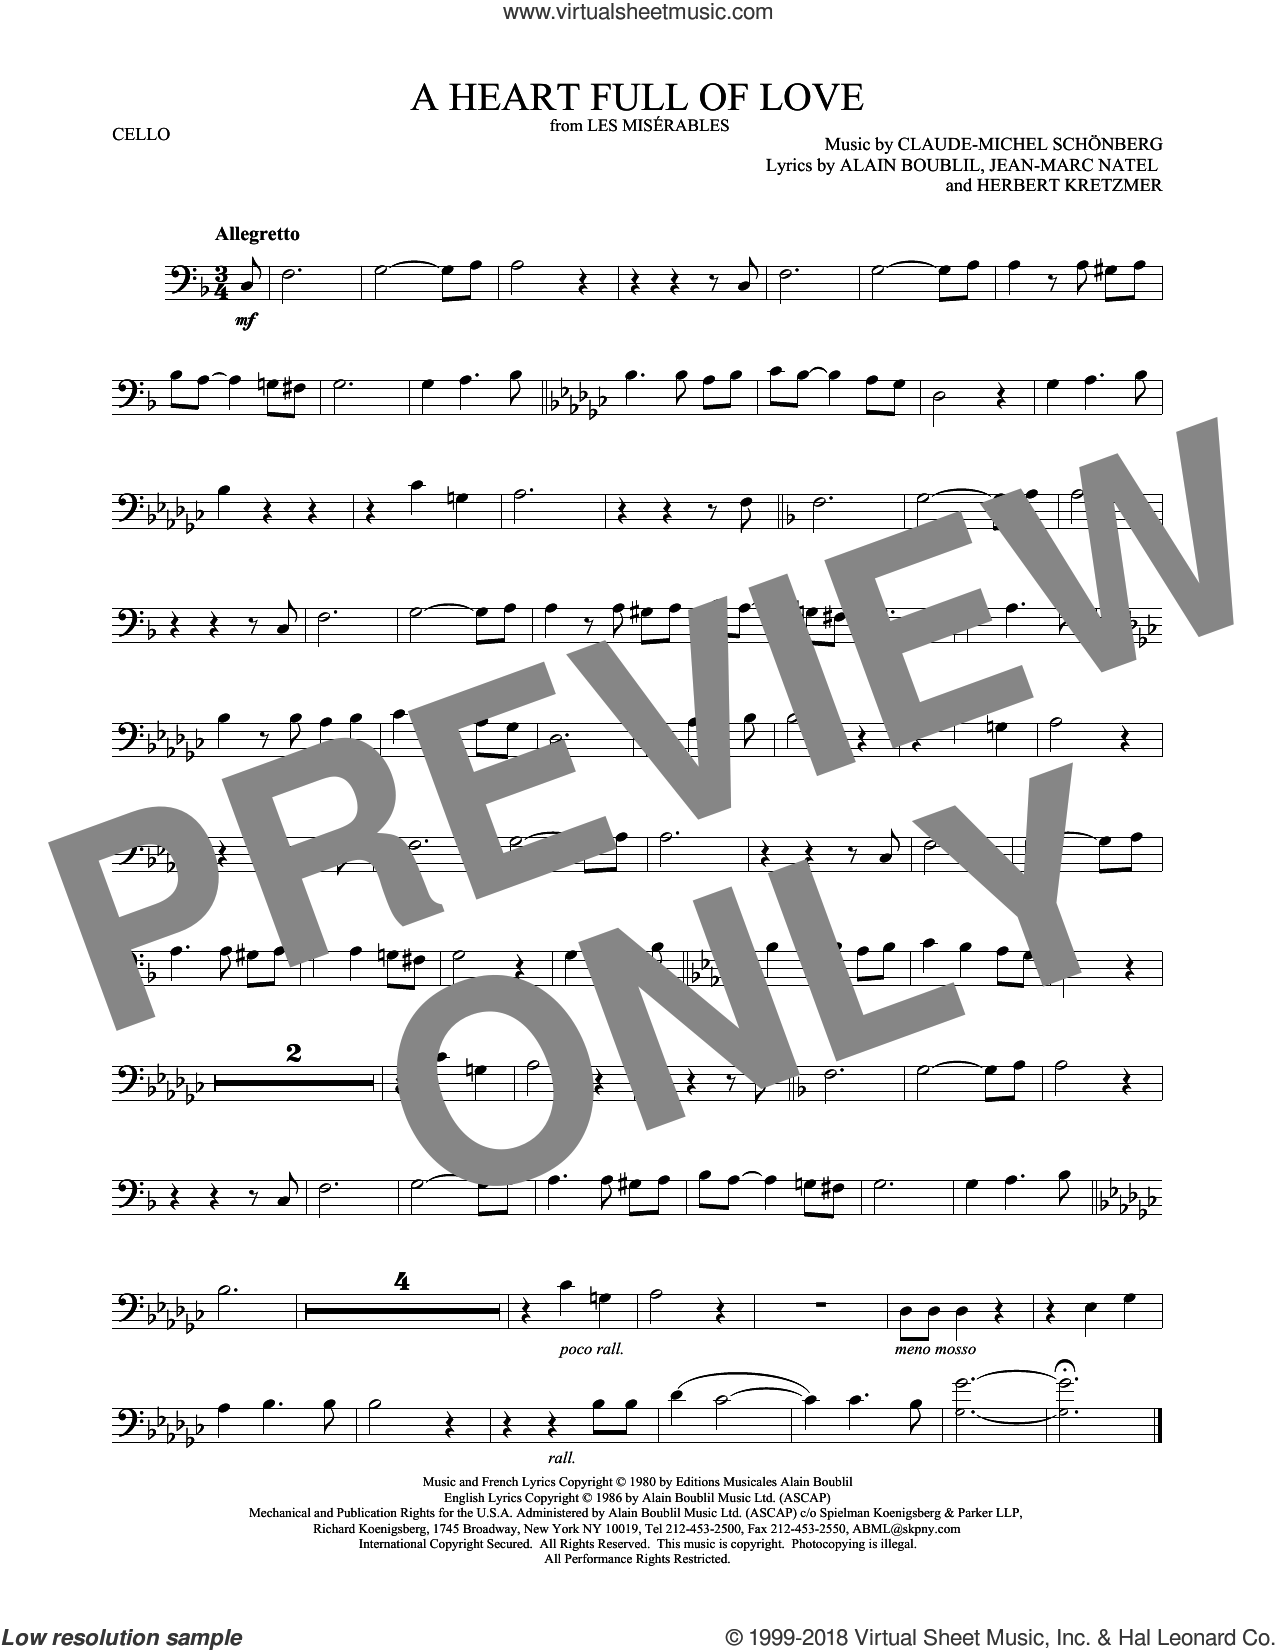 A Heart Full Of Love sheet music for cello solo by Alain Boublil, Claude-Michel Schonberg, Herbert Kretzmer and Jean-Marc Natel, intermediate skill level